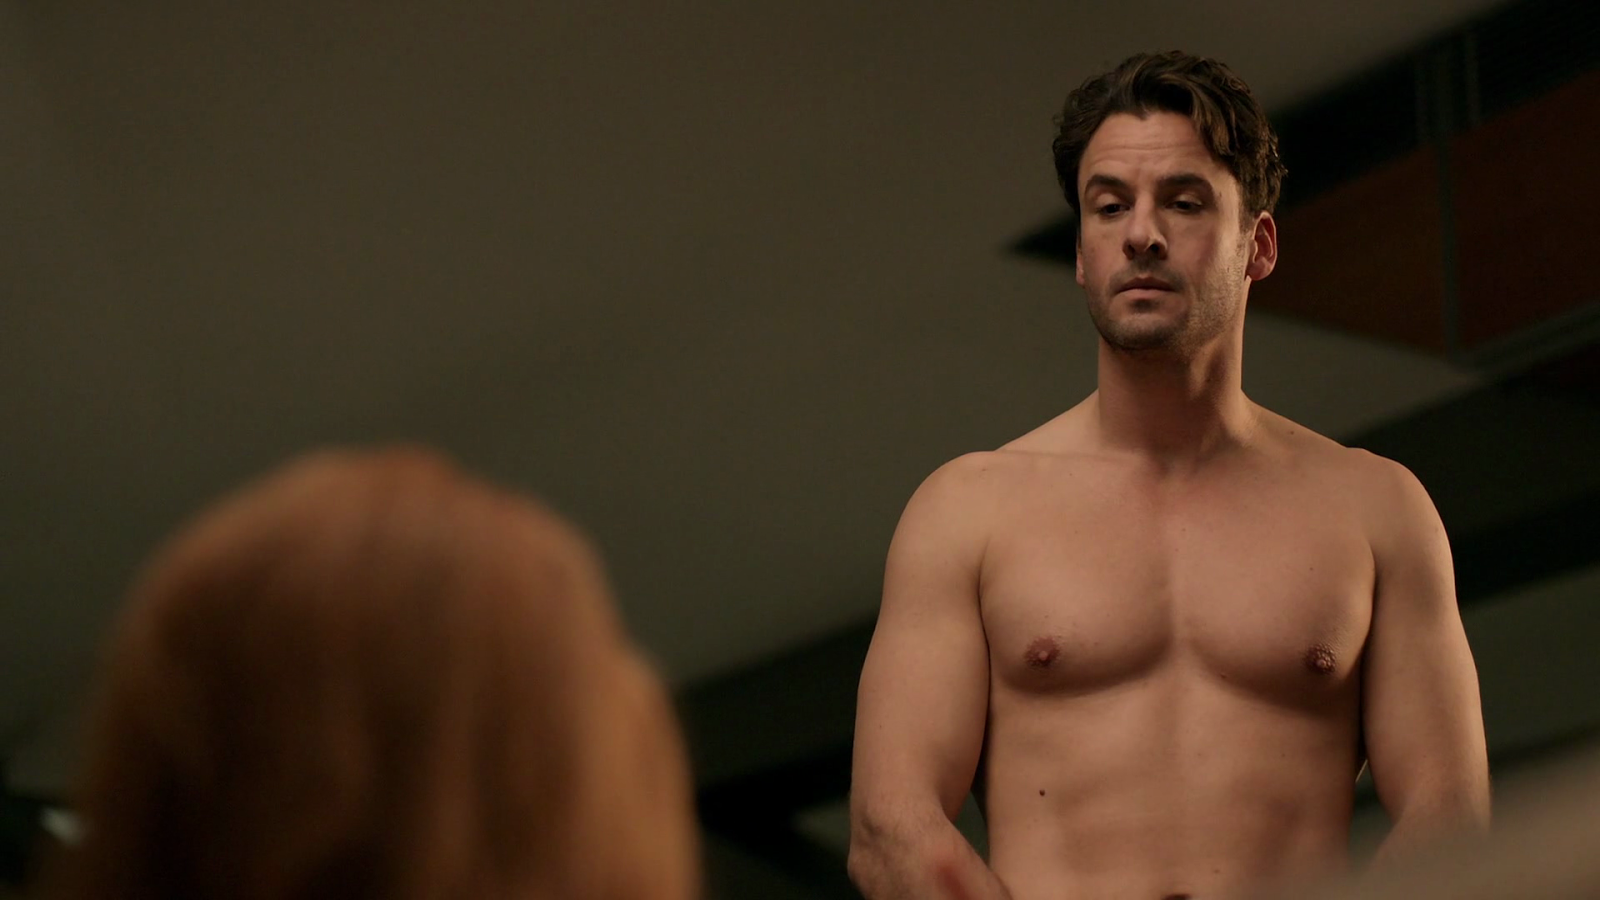 Shirtless Men On The Blog: Tiago Correa Mostra Il Sedere